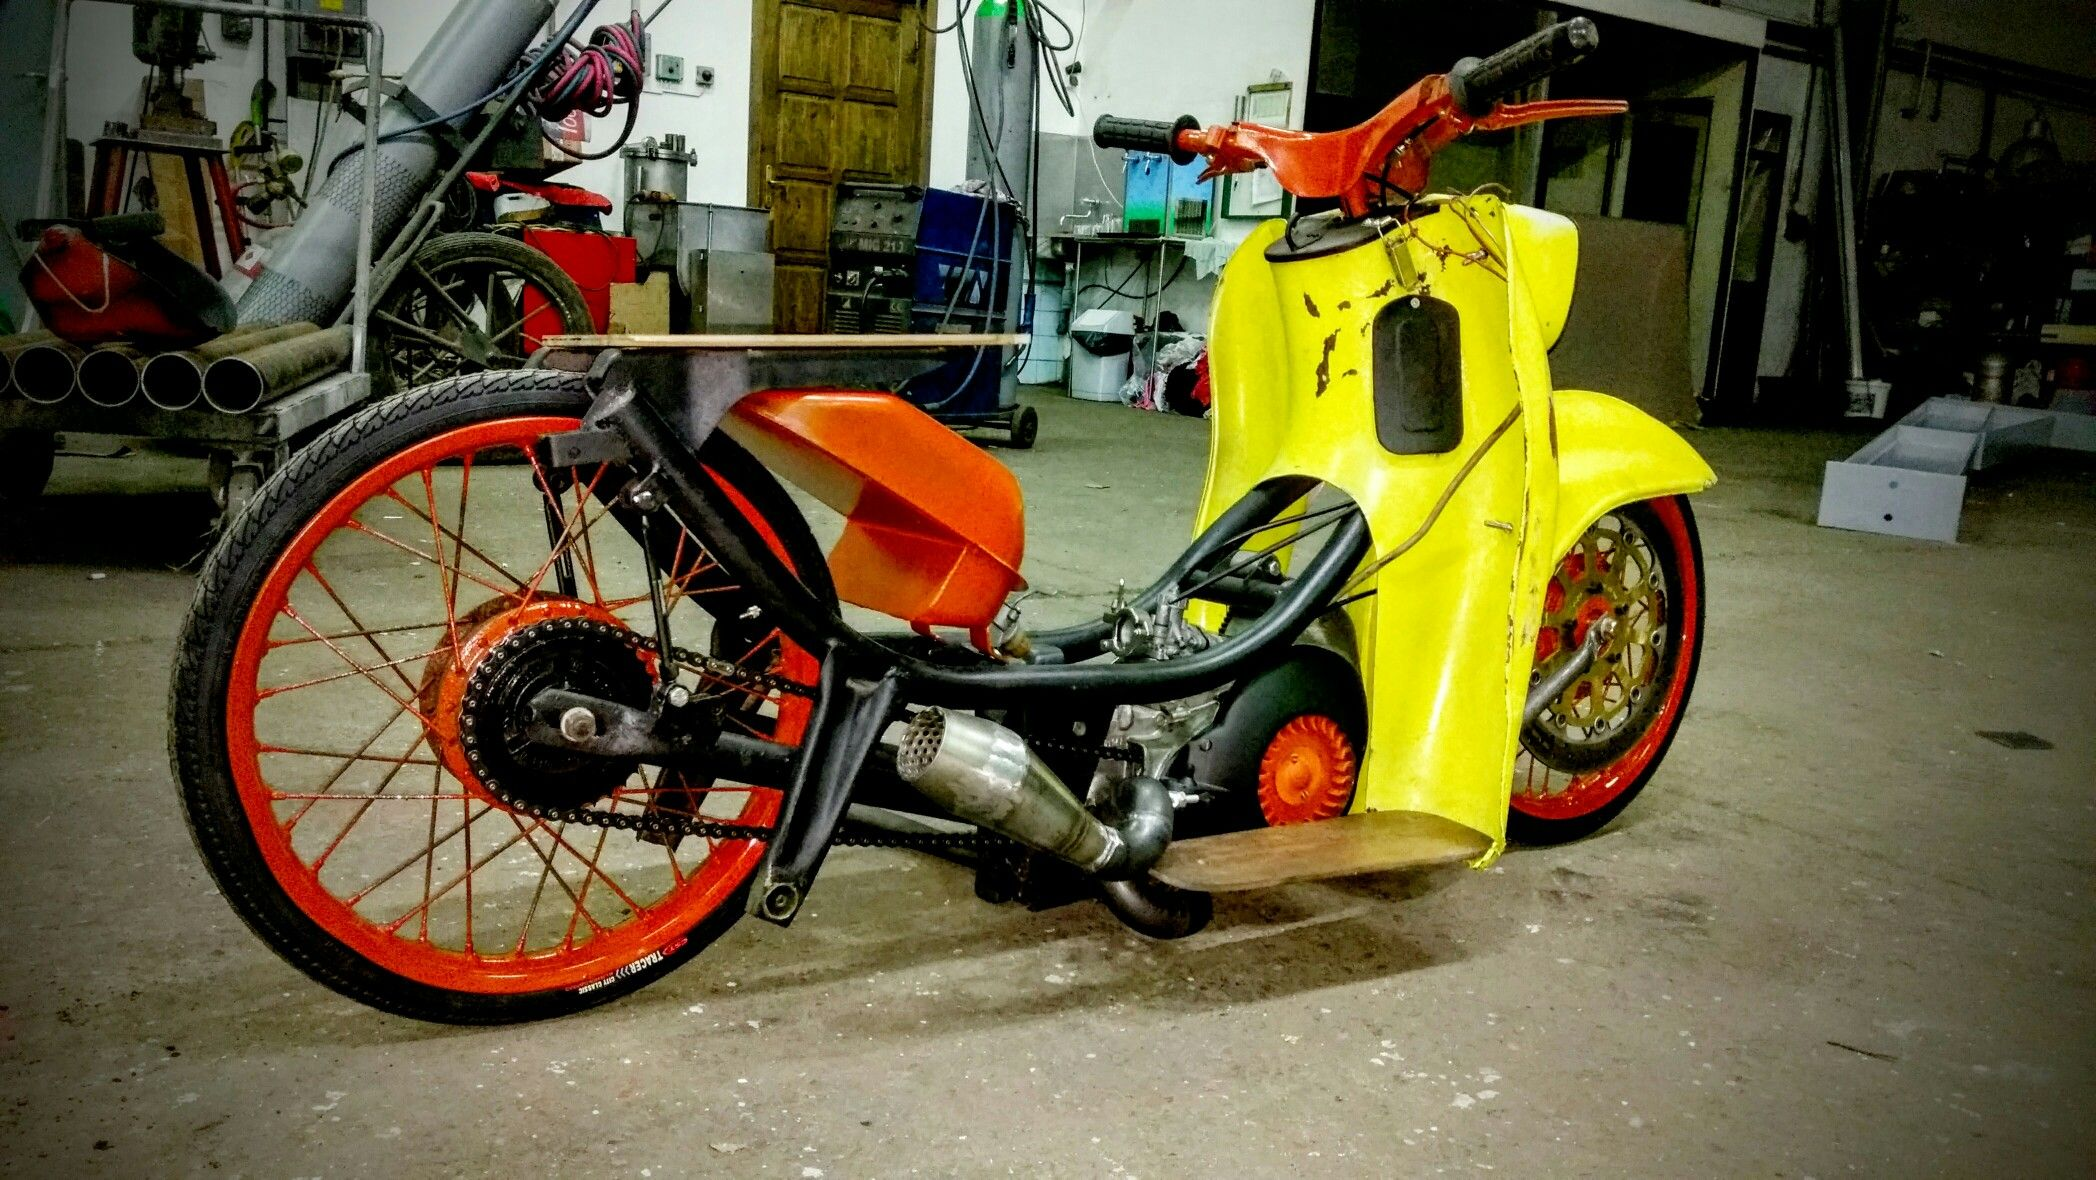 schwalbe my simson motorcycle motorcycle bike und. Black Bedroom Furniture Sets. Home Design Ideas